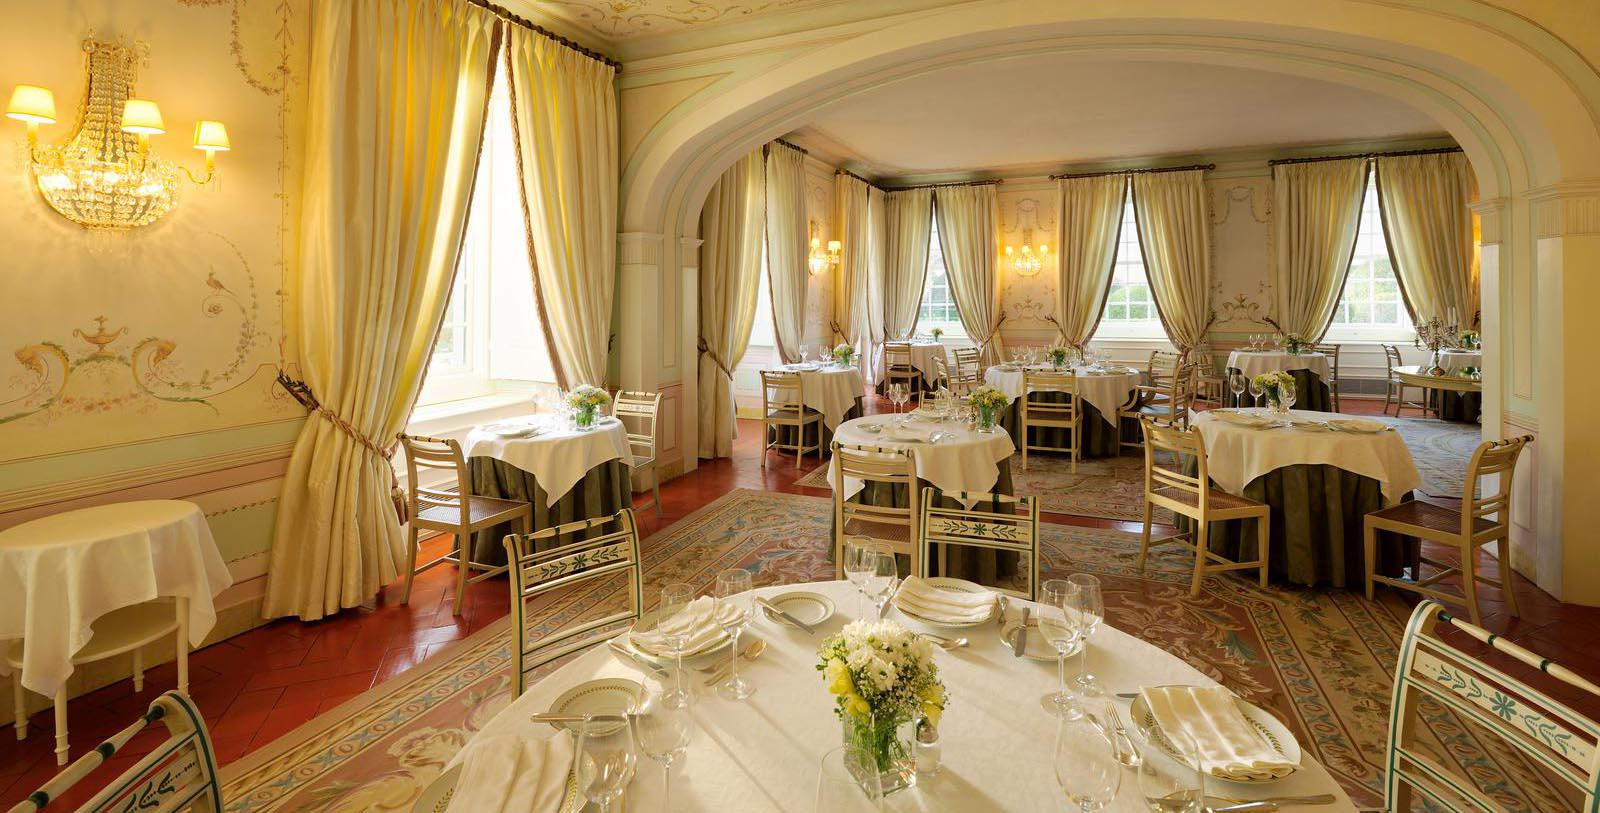 Image of Dining Room at Seteais Restaurant at Tivoli Palacio de Seteais, 1787, Member of Historic Hotels Worldwide, in Sintra, Portugal, Dining